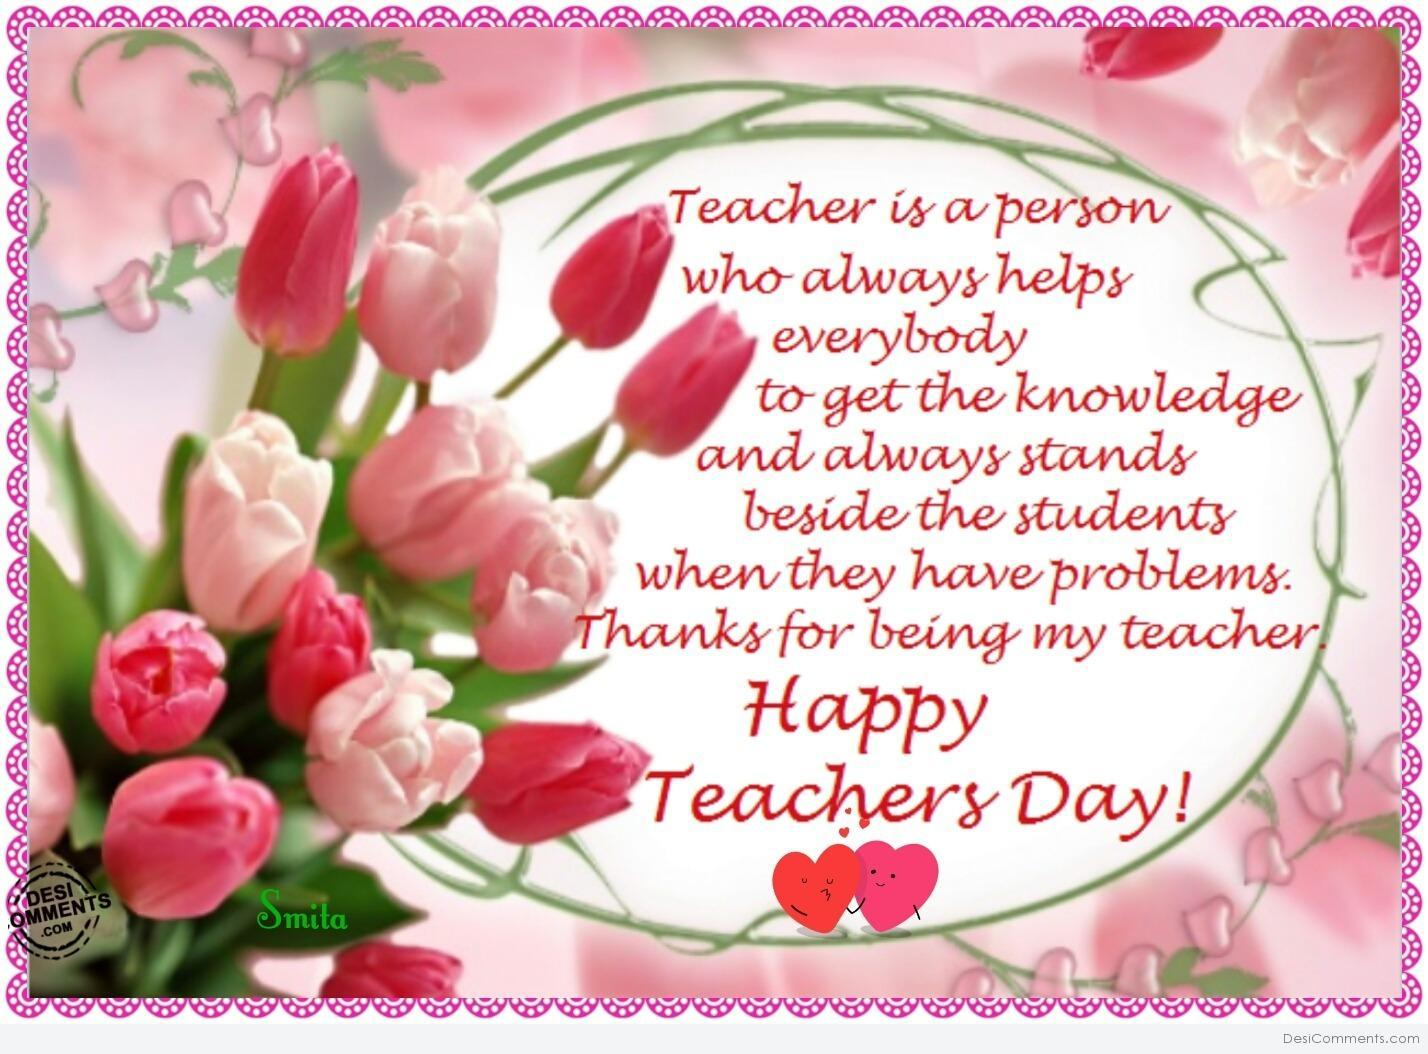 World Teachers Day Wallpapers Wallpaper Cave